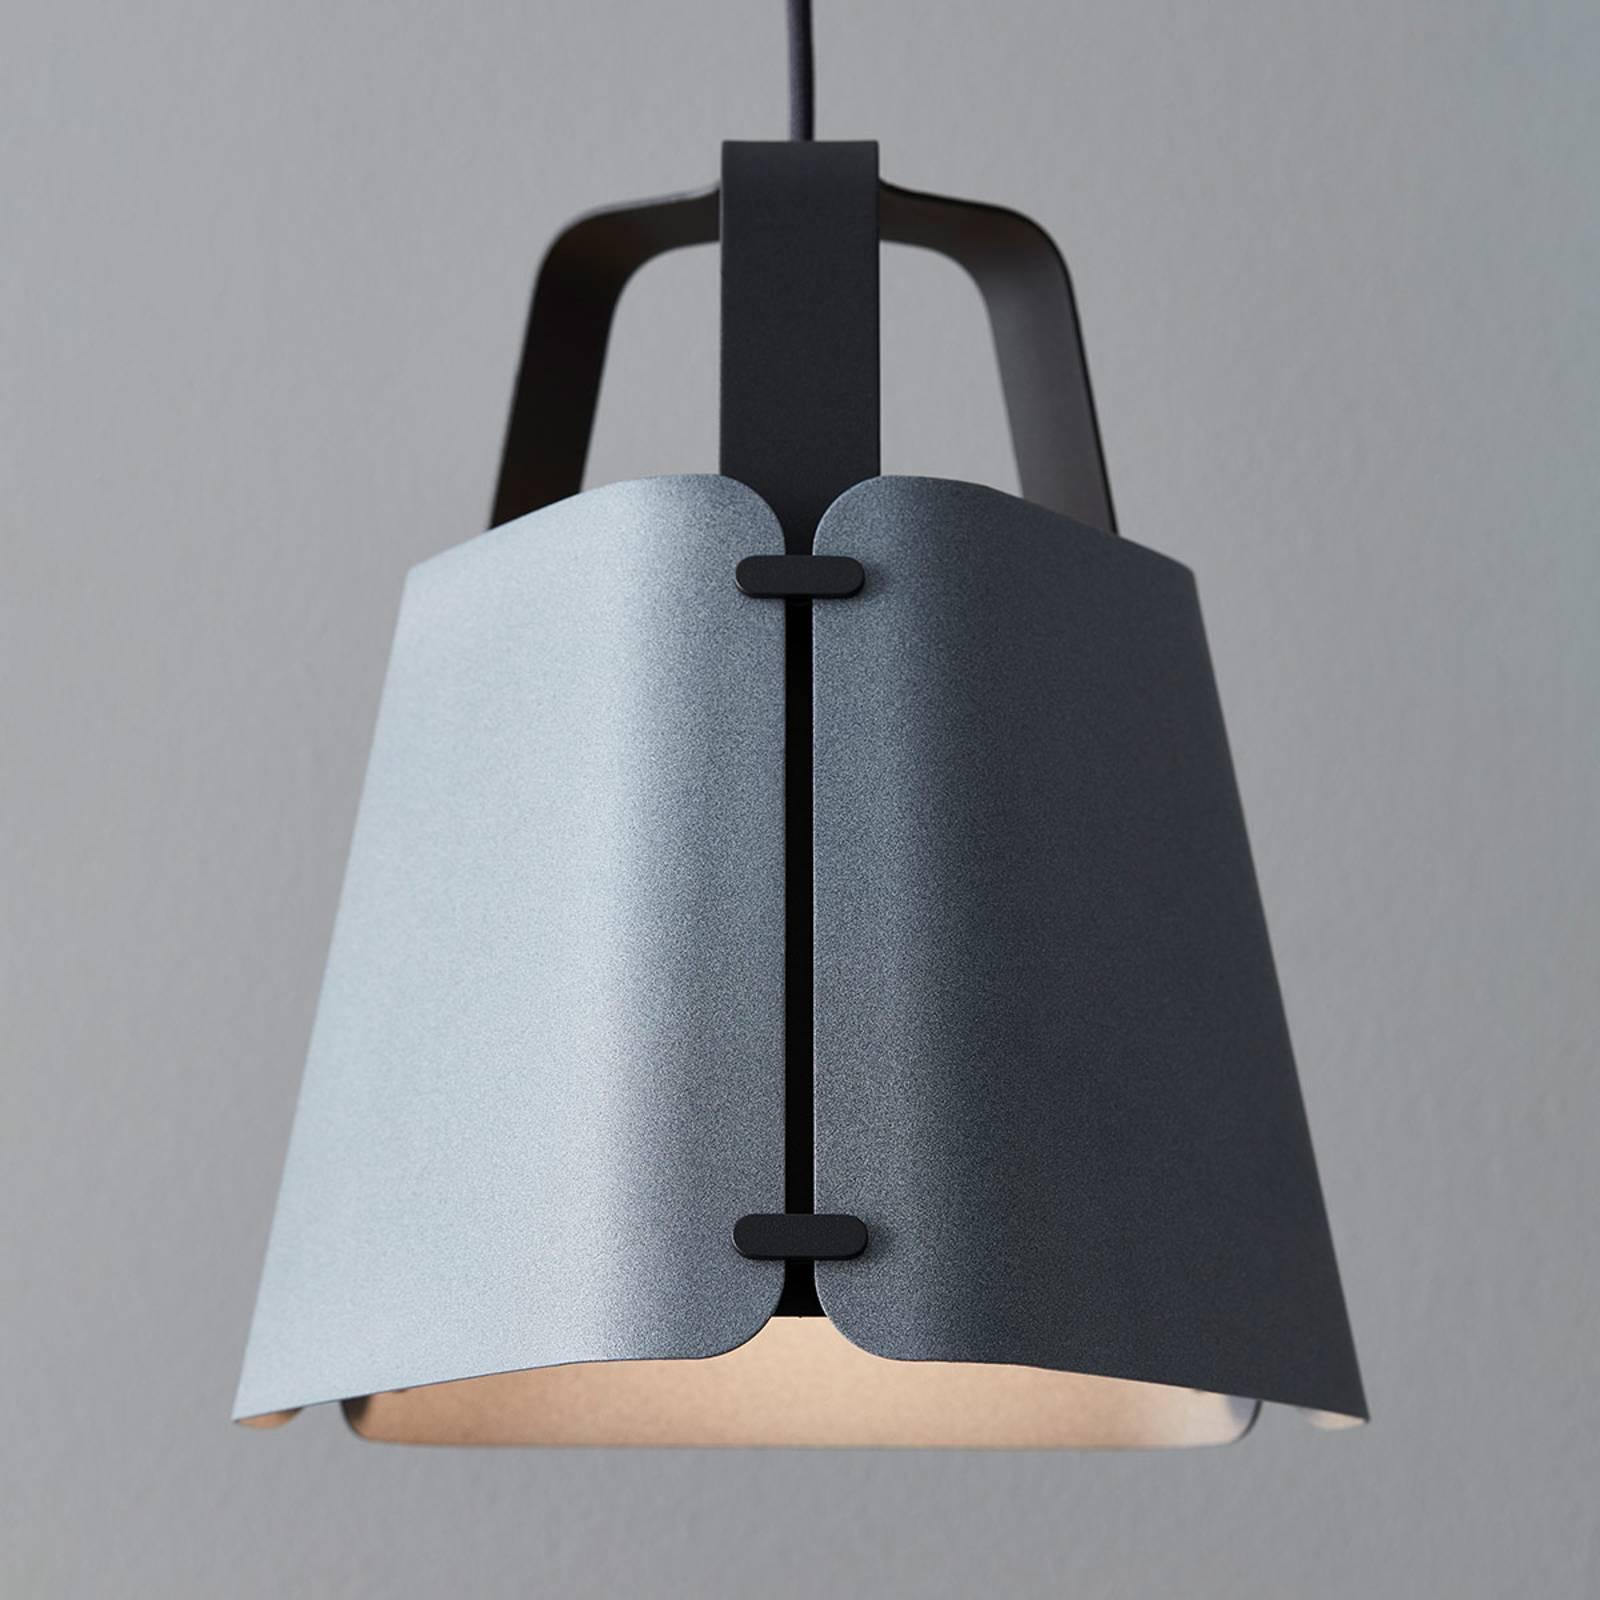 Hanglamp Fold, betonstructuur, 27,5 cm